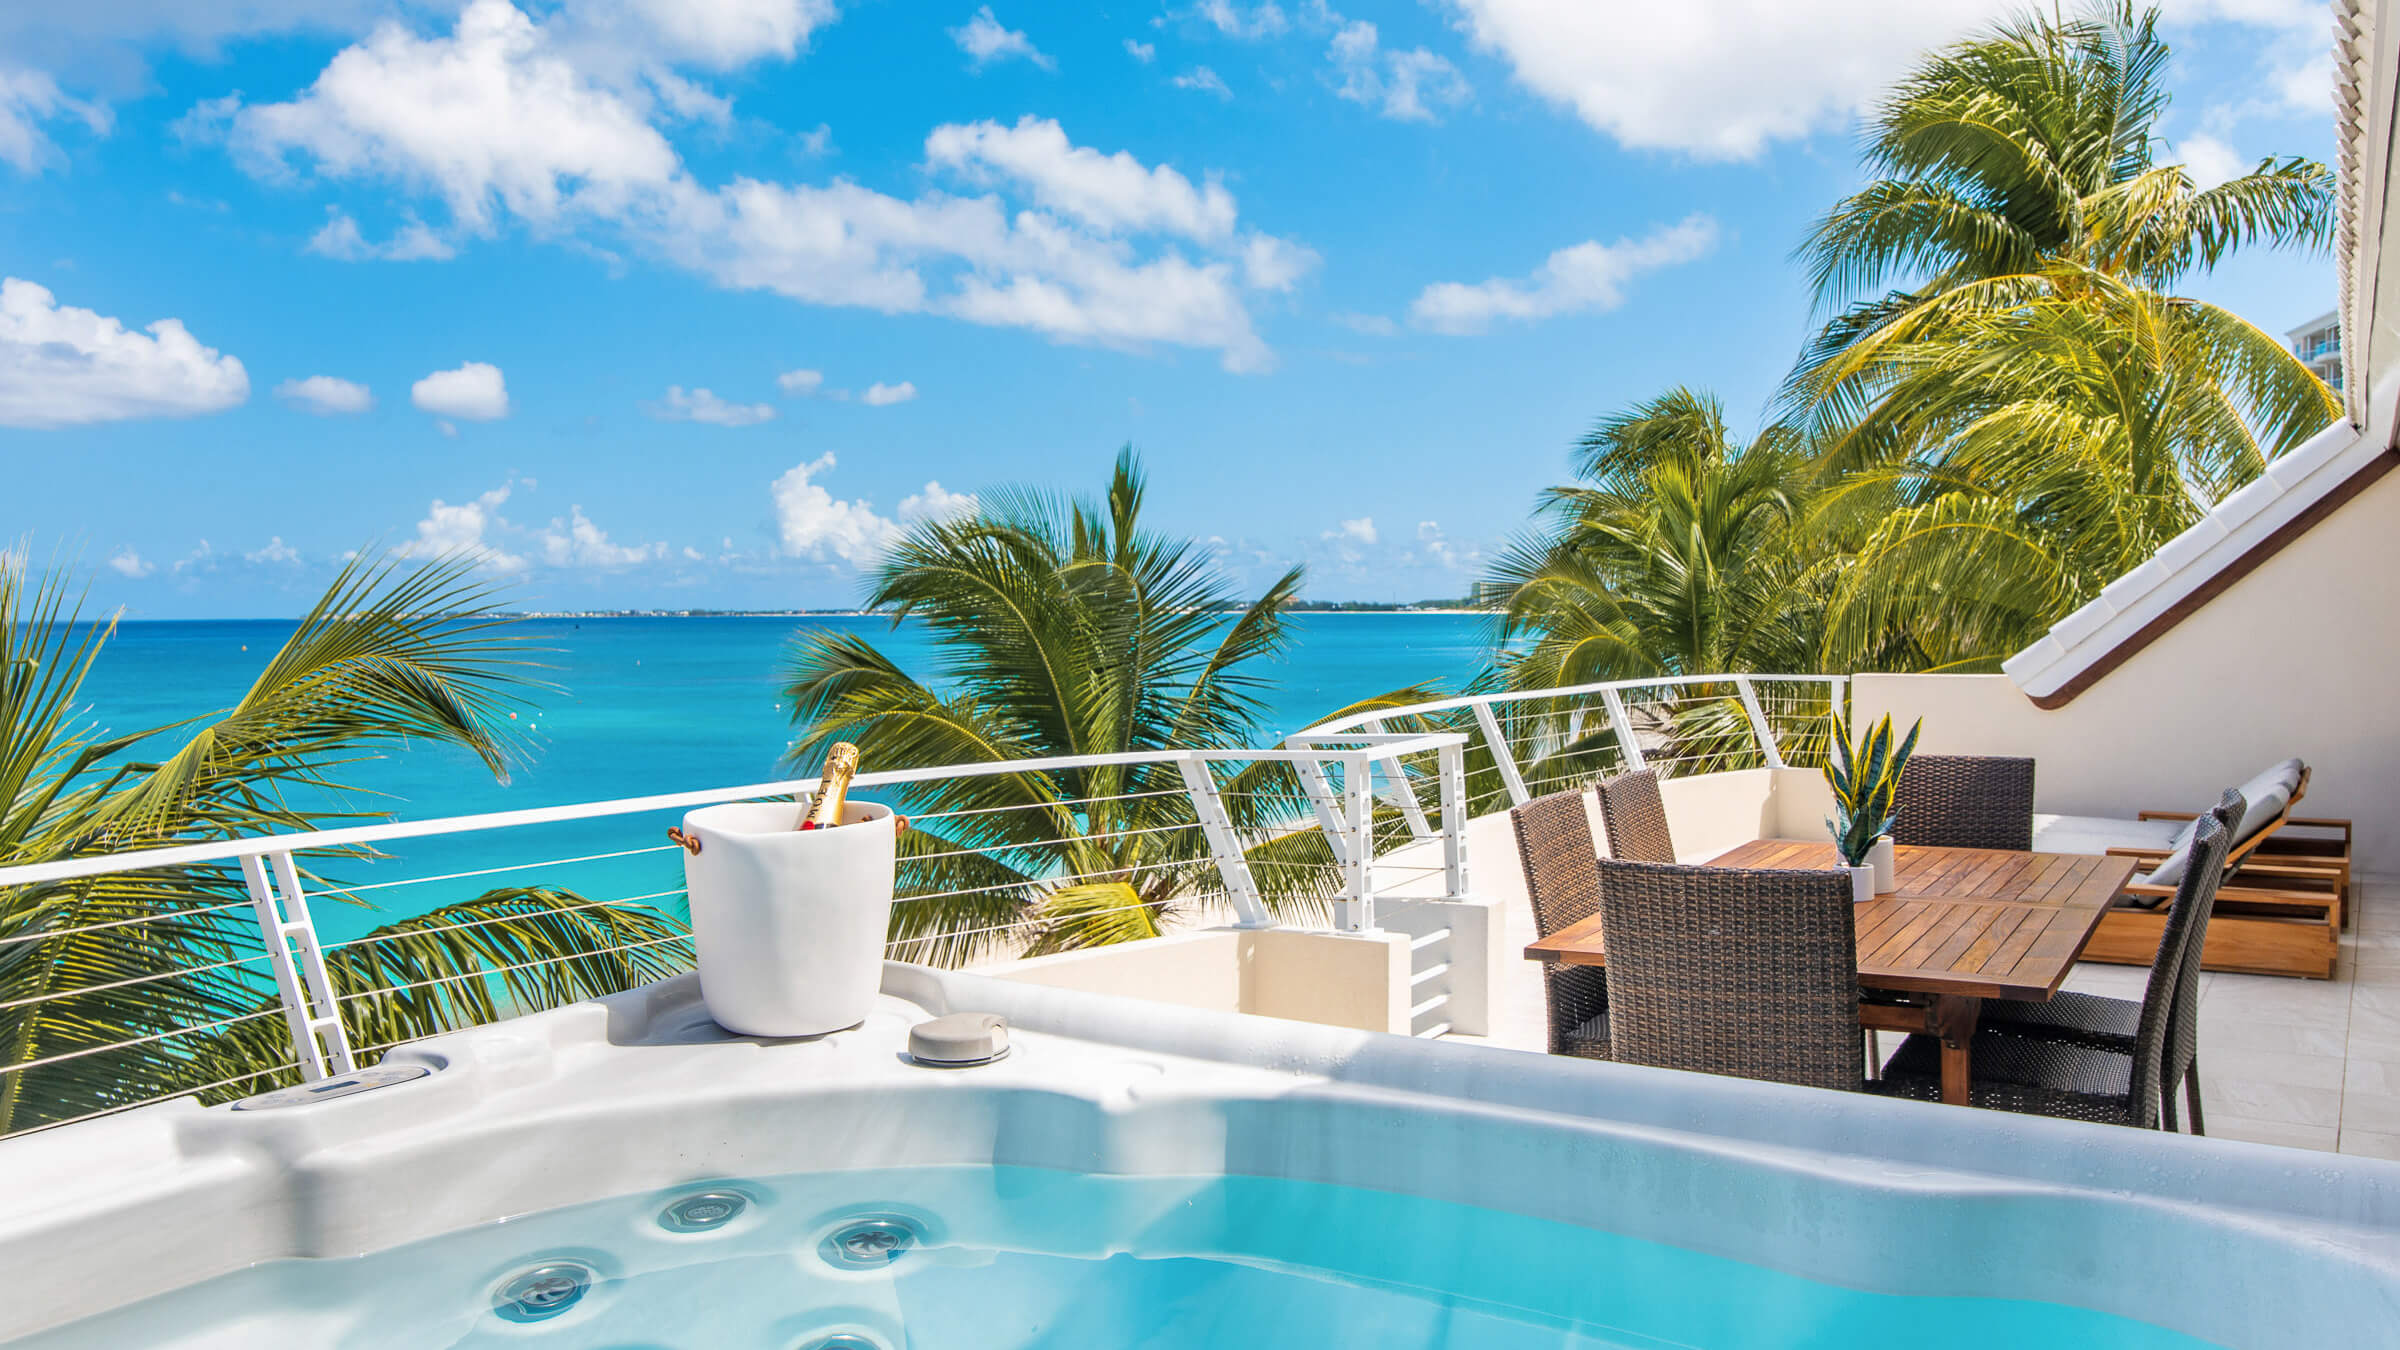 Seascape-Villa-Beach-Villa-Cayman-Islands-Grand-Cayman-Paradise-Jacuzzi.jpg